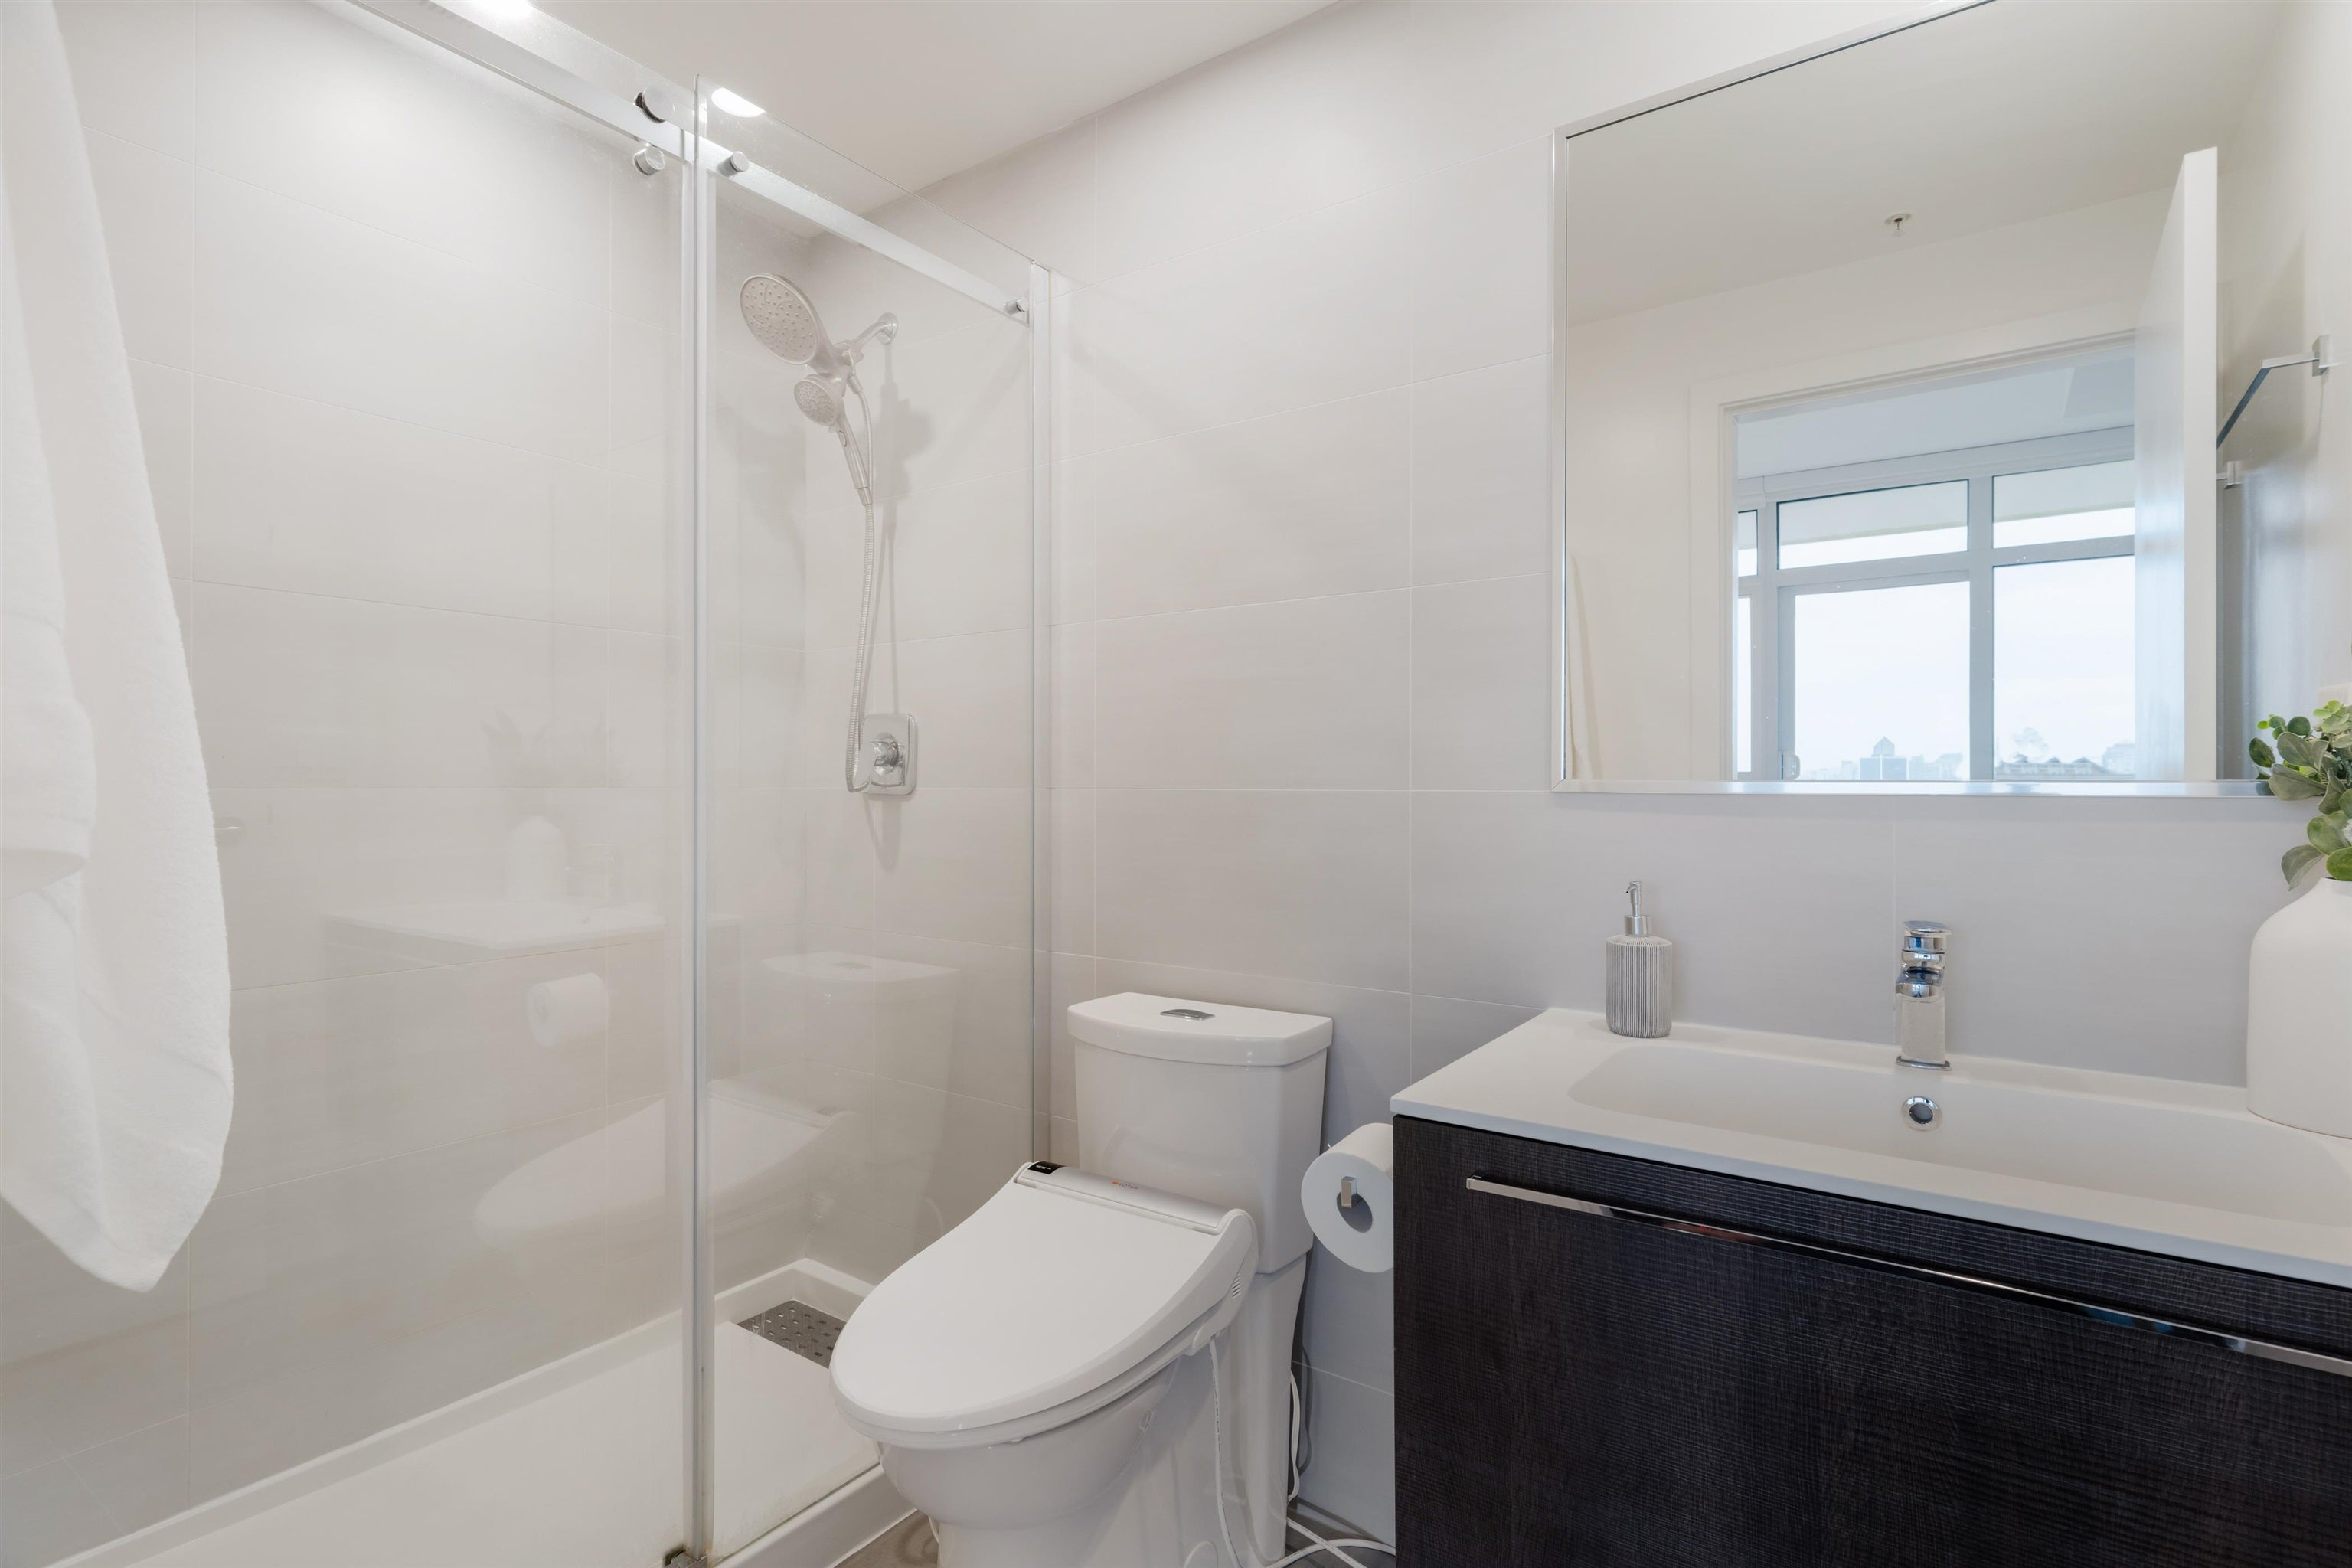 523 2508 WATSON STREET - Mount Pleasant VE Townhouse for sale, 3 Bedrooms (R2625701) - #22